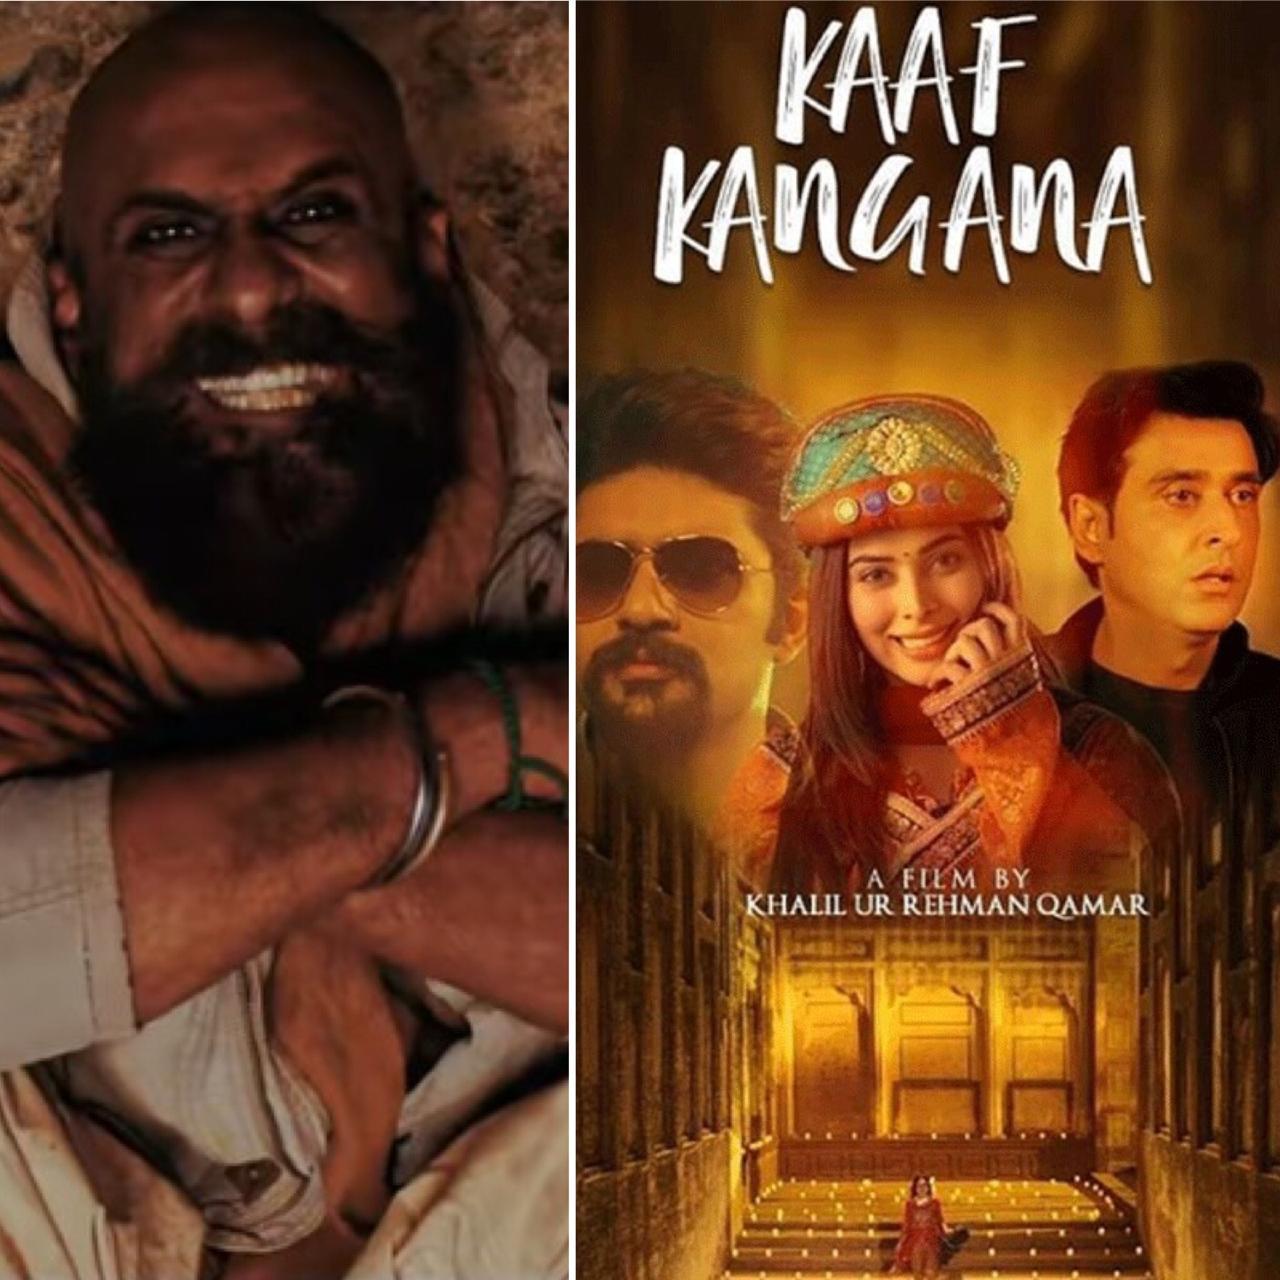 durj kaaf kangana to clash at the box office